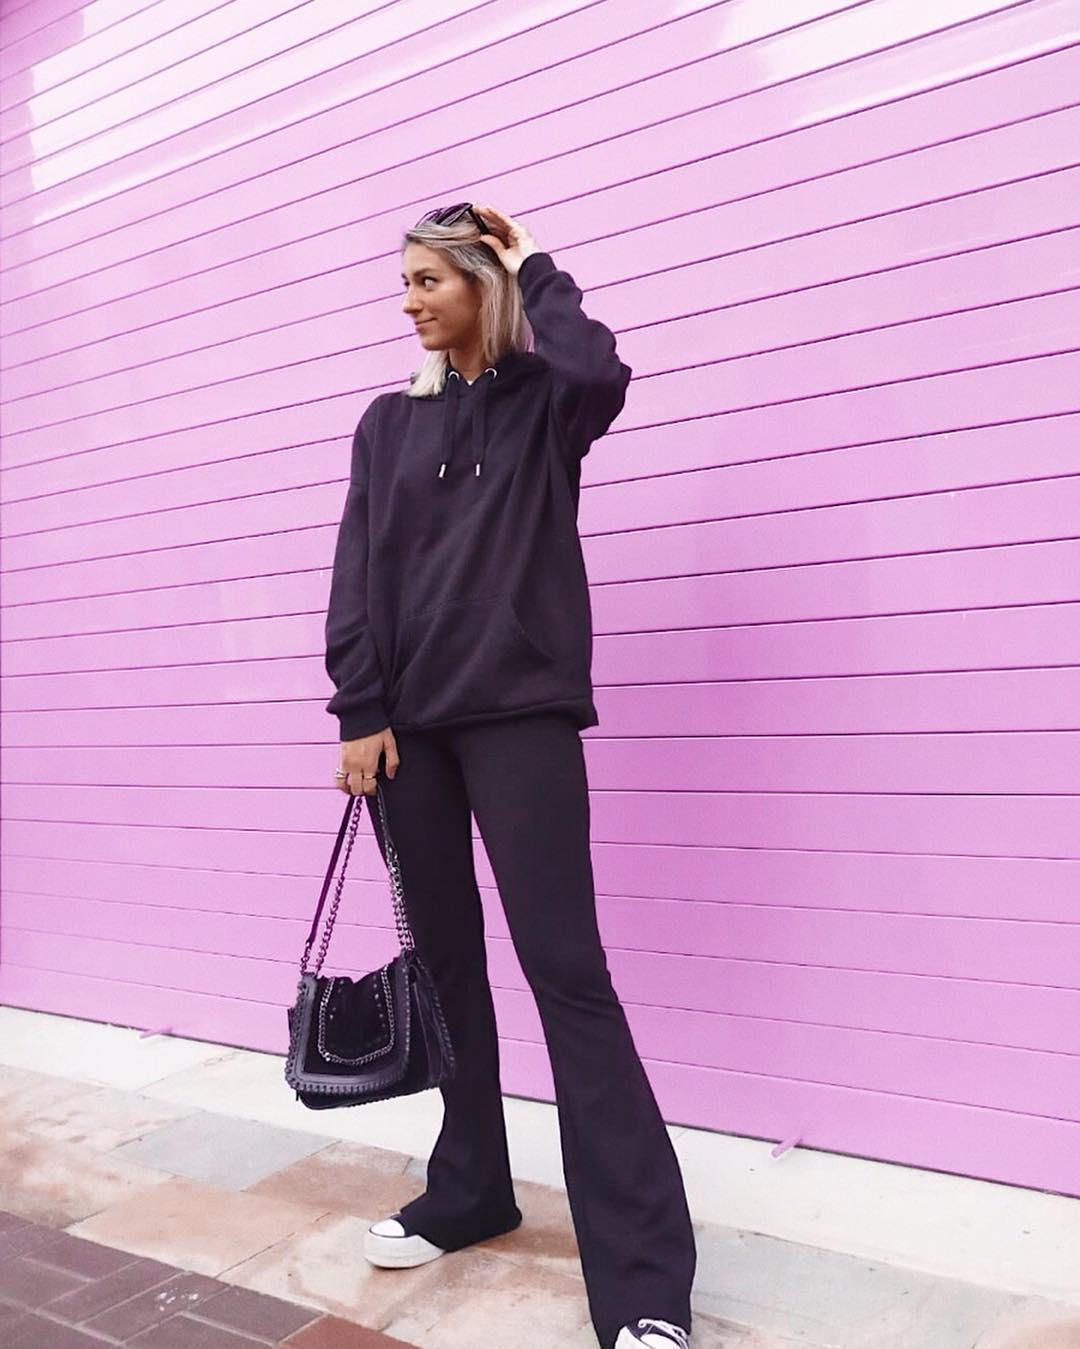 chain leather shoulder bag de Zara sur sorayagprieto